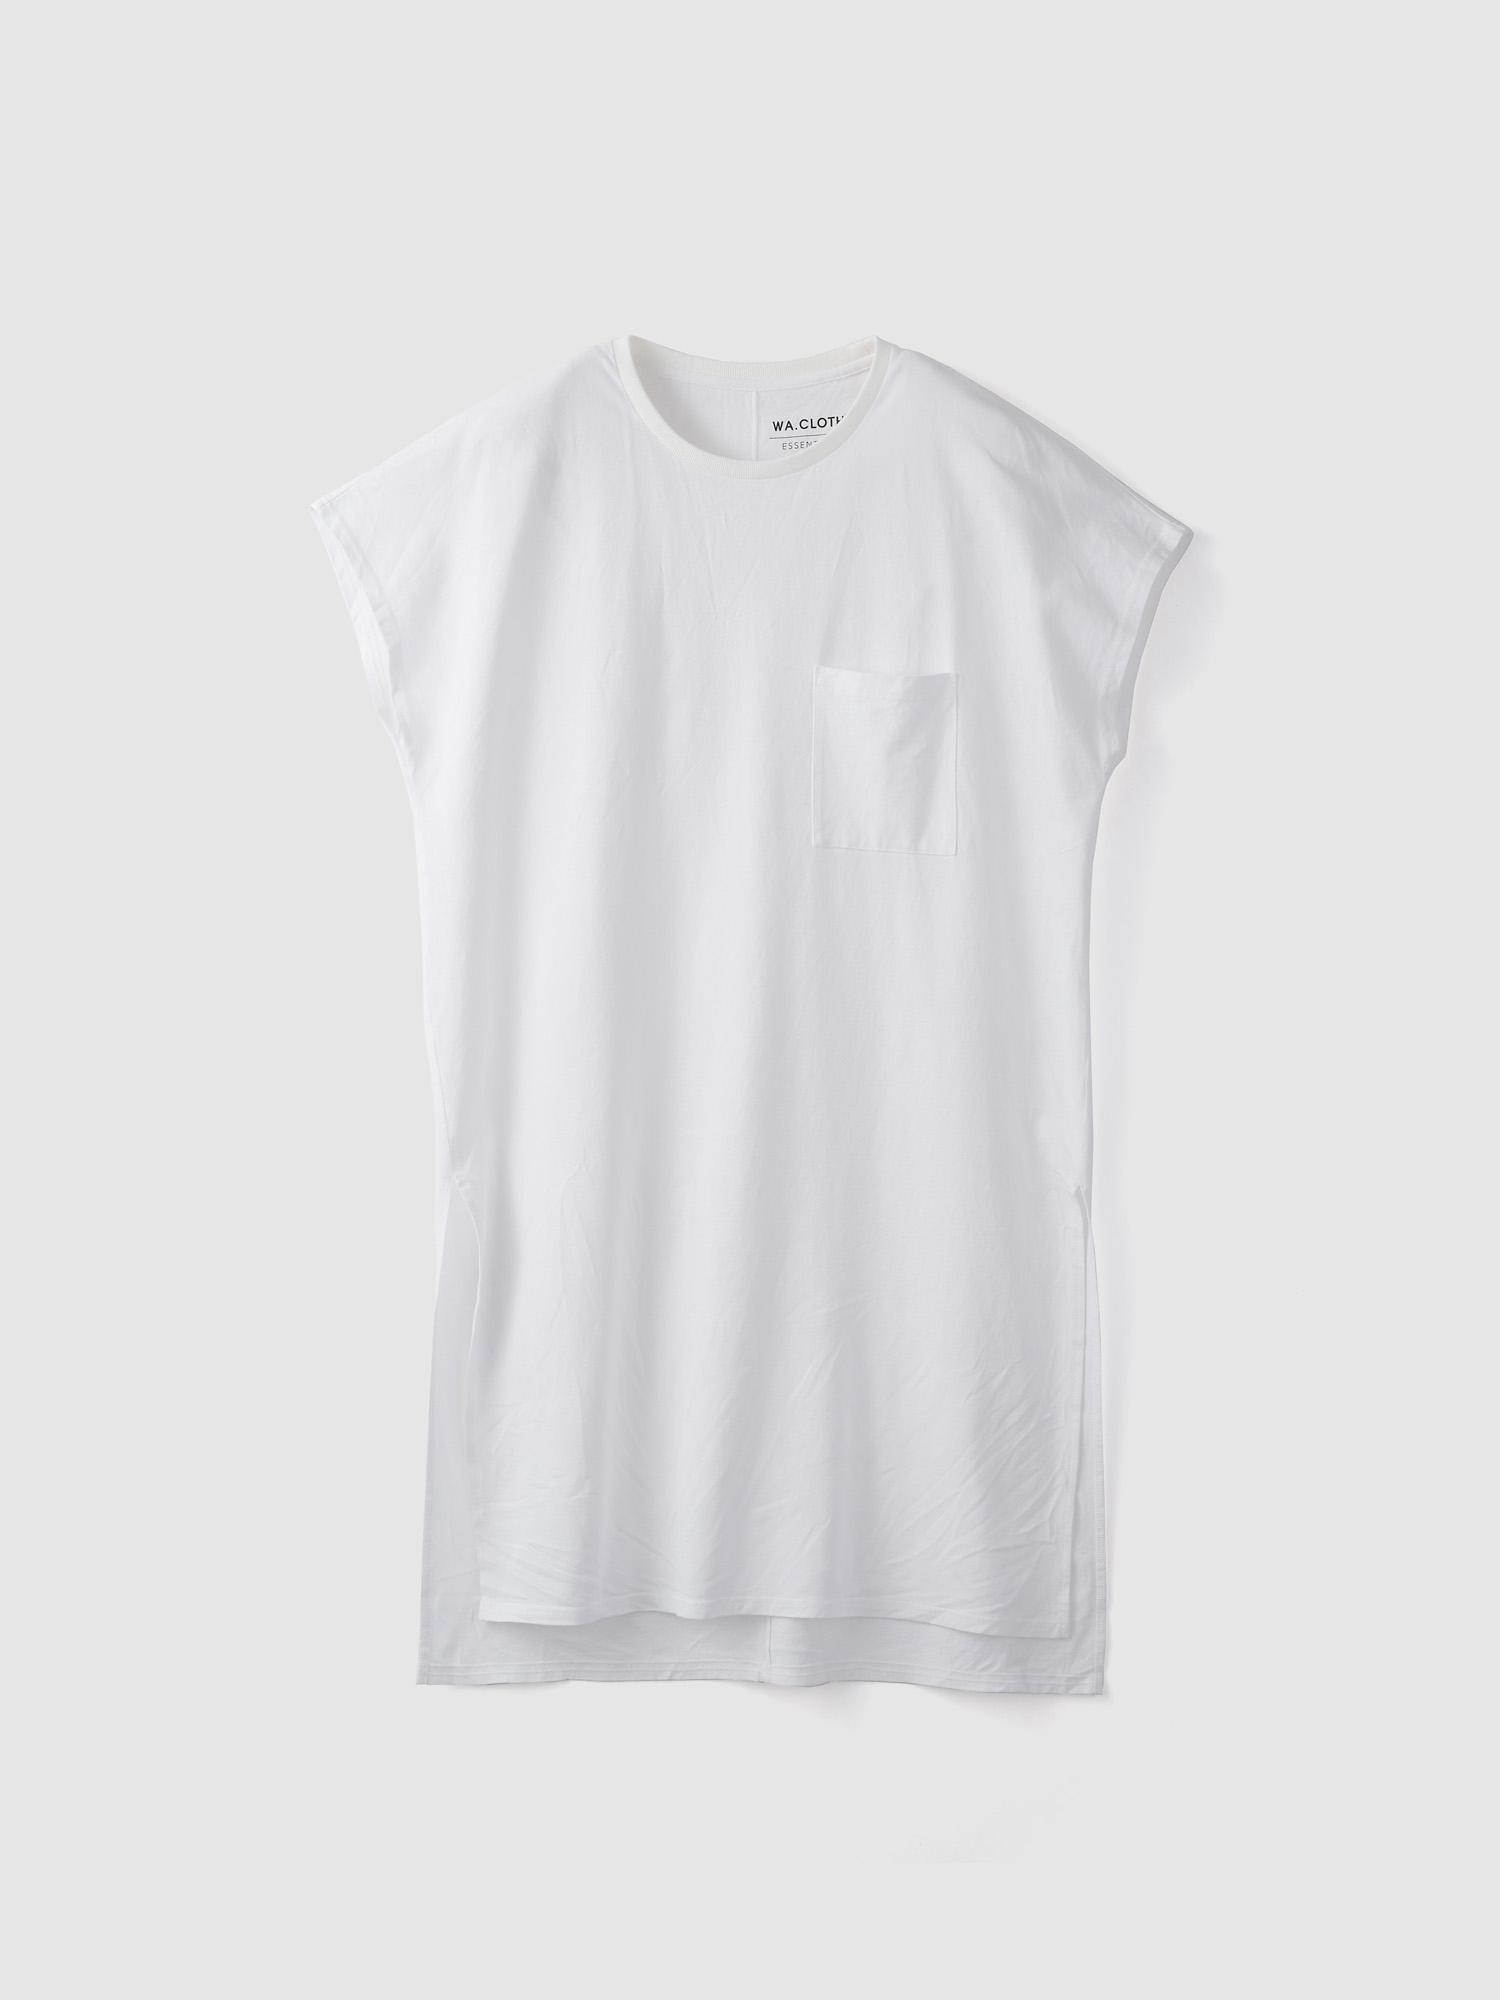 Women's COMFORT DRESS TUNIC T-SHIRTのサムネイル2